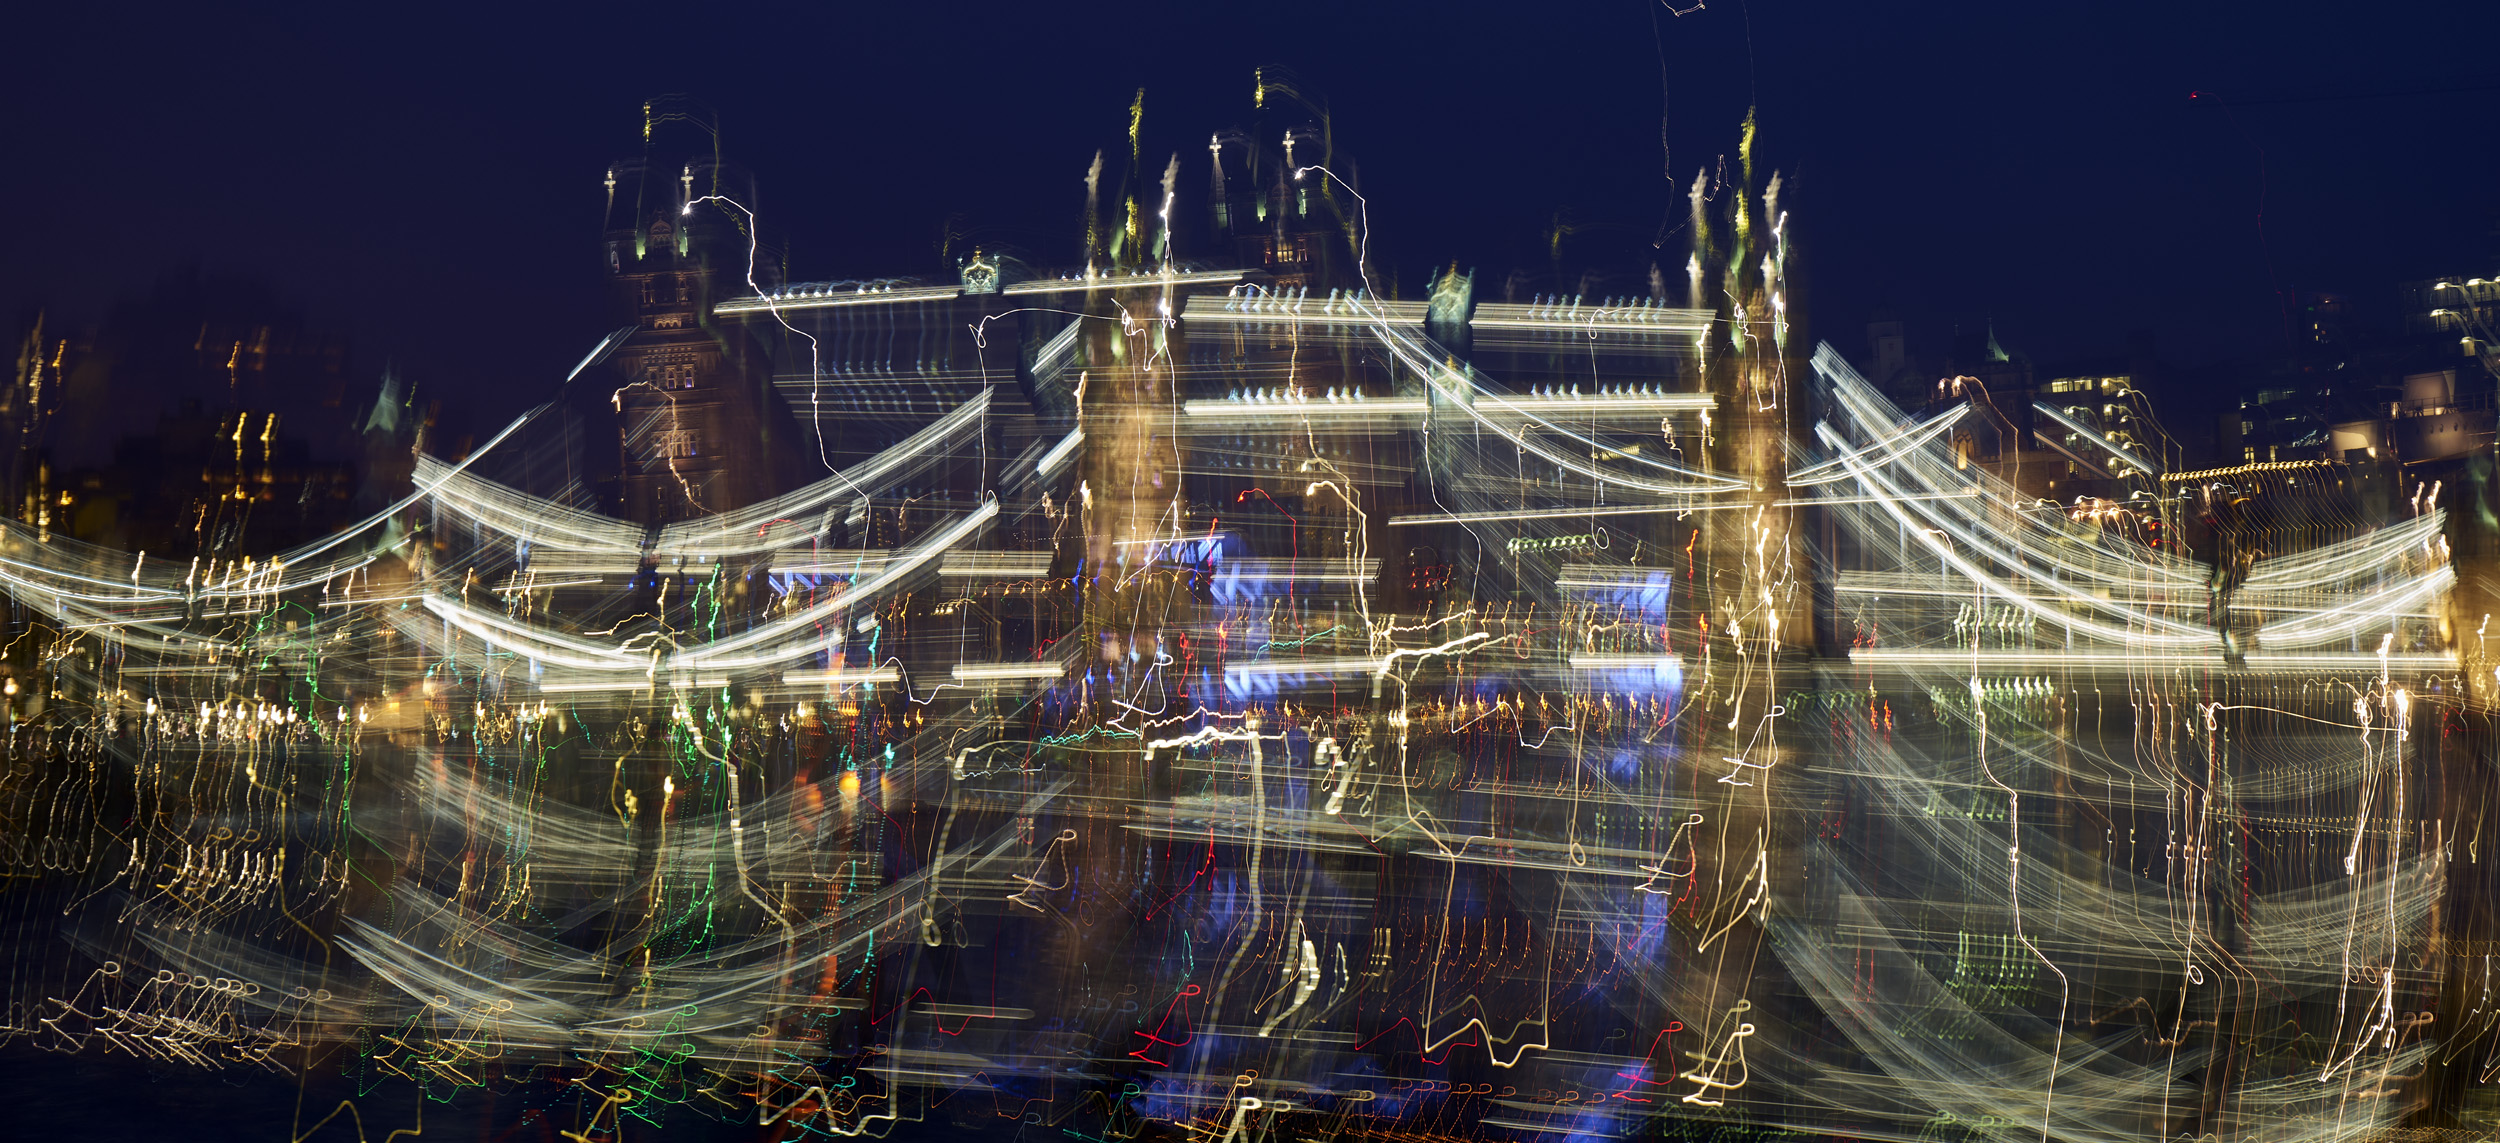 The Tower Bridge has been drinking